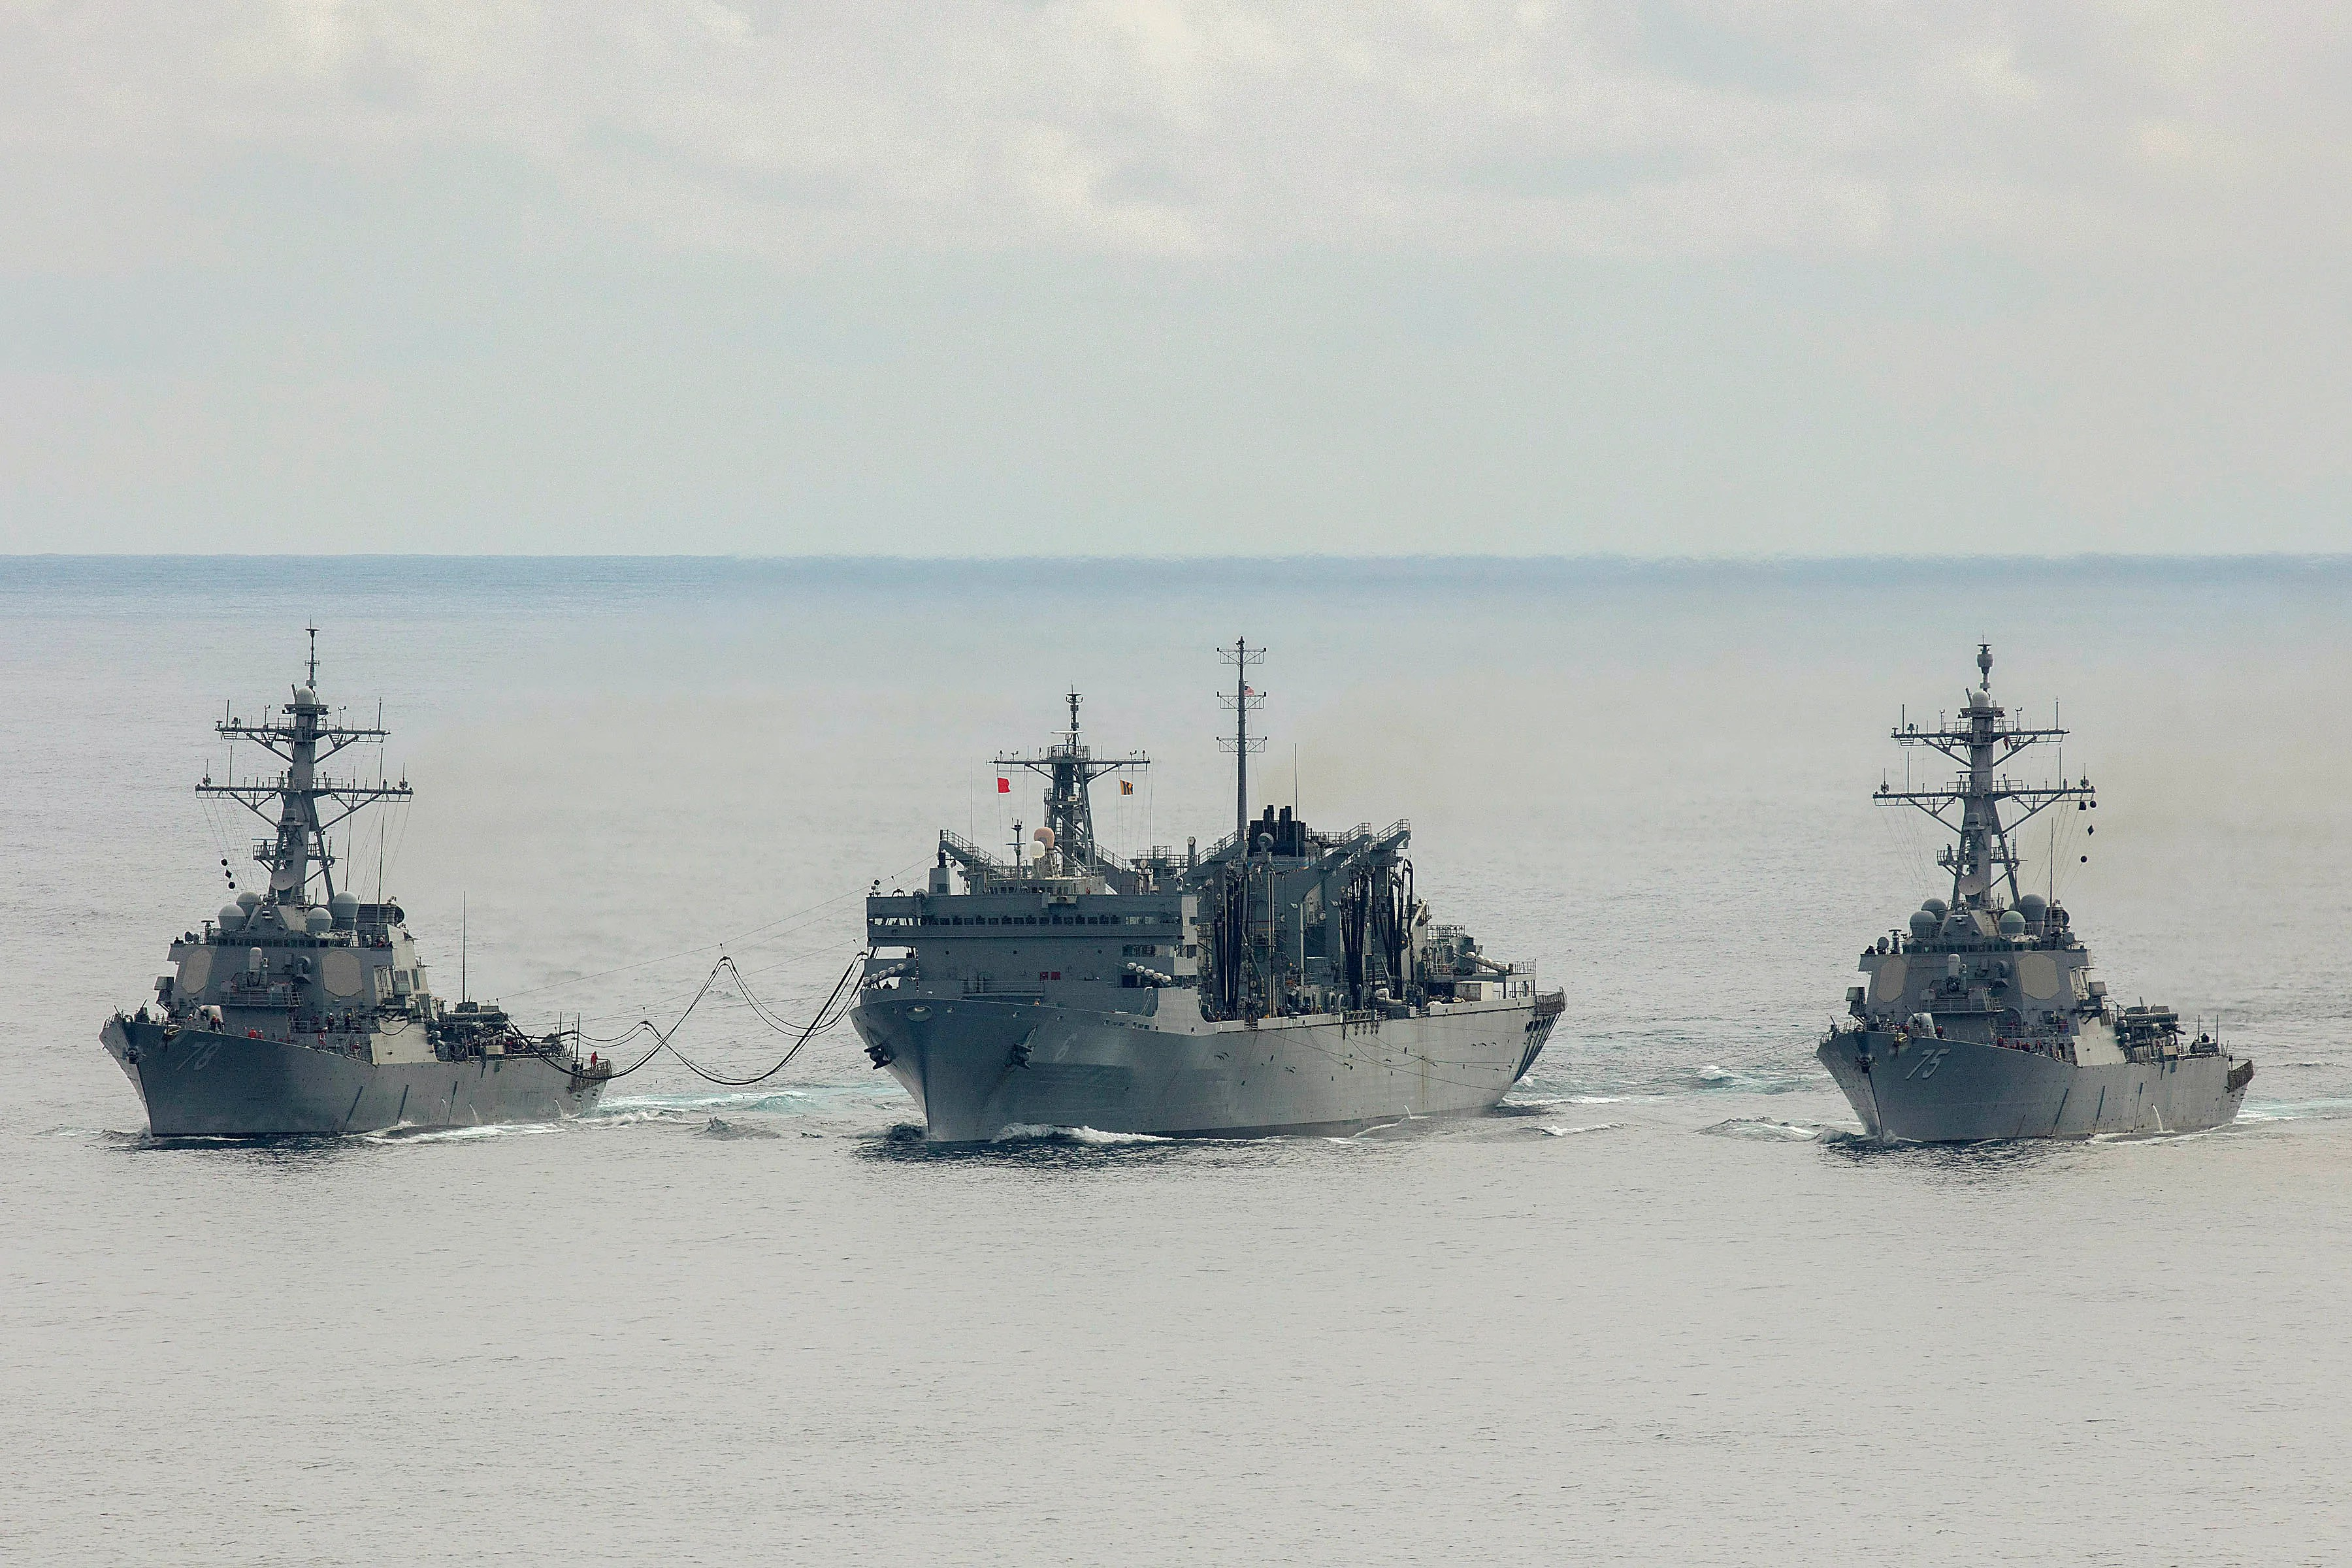 US Navy and Royal Navy Ships Conduct Anti-submarine Exercise Above Arctic Circle